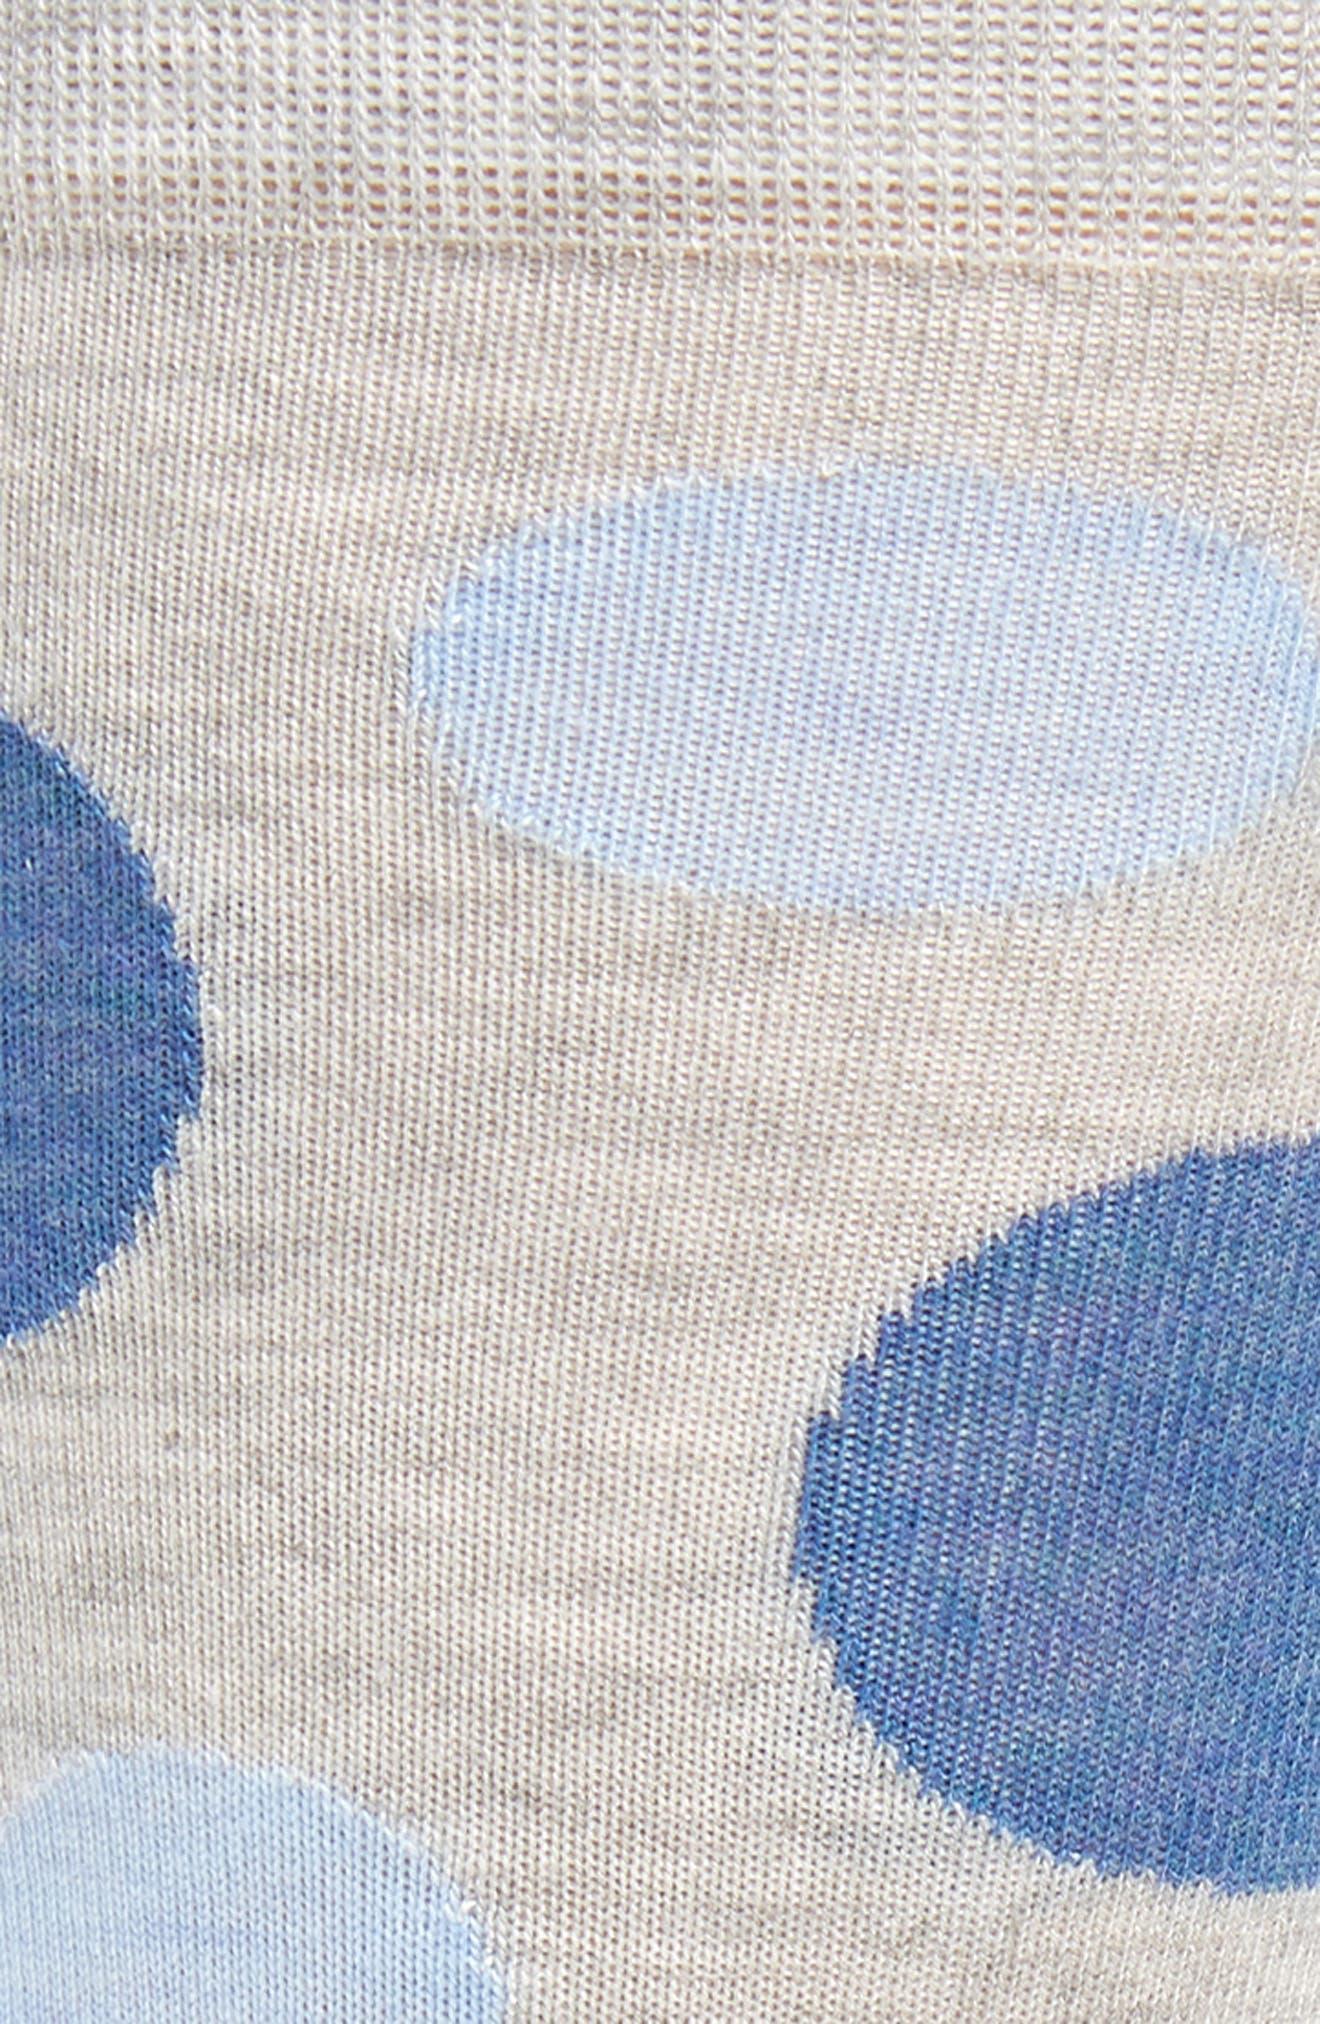 Dot Socks,                             Alternate thumbnail 2, color,                             Grey/ Blue